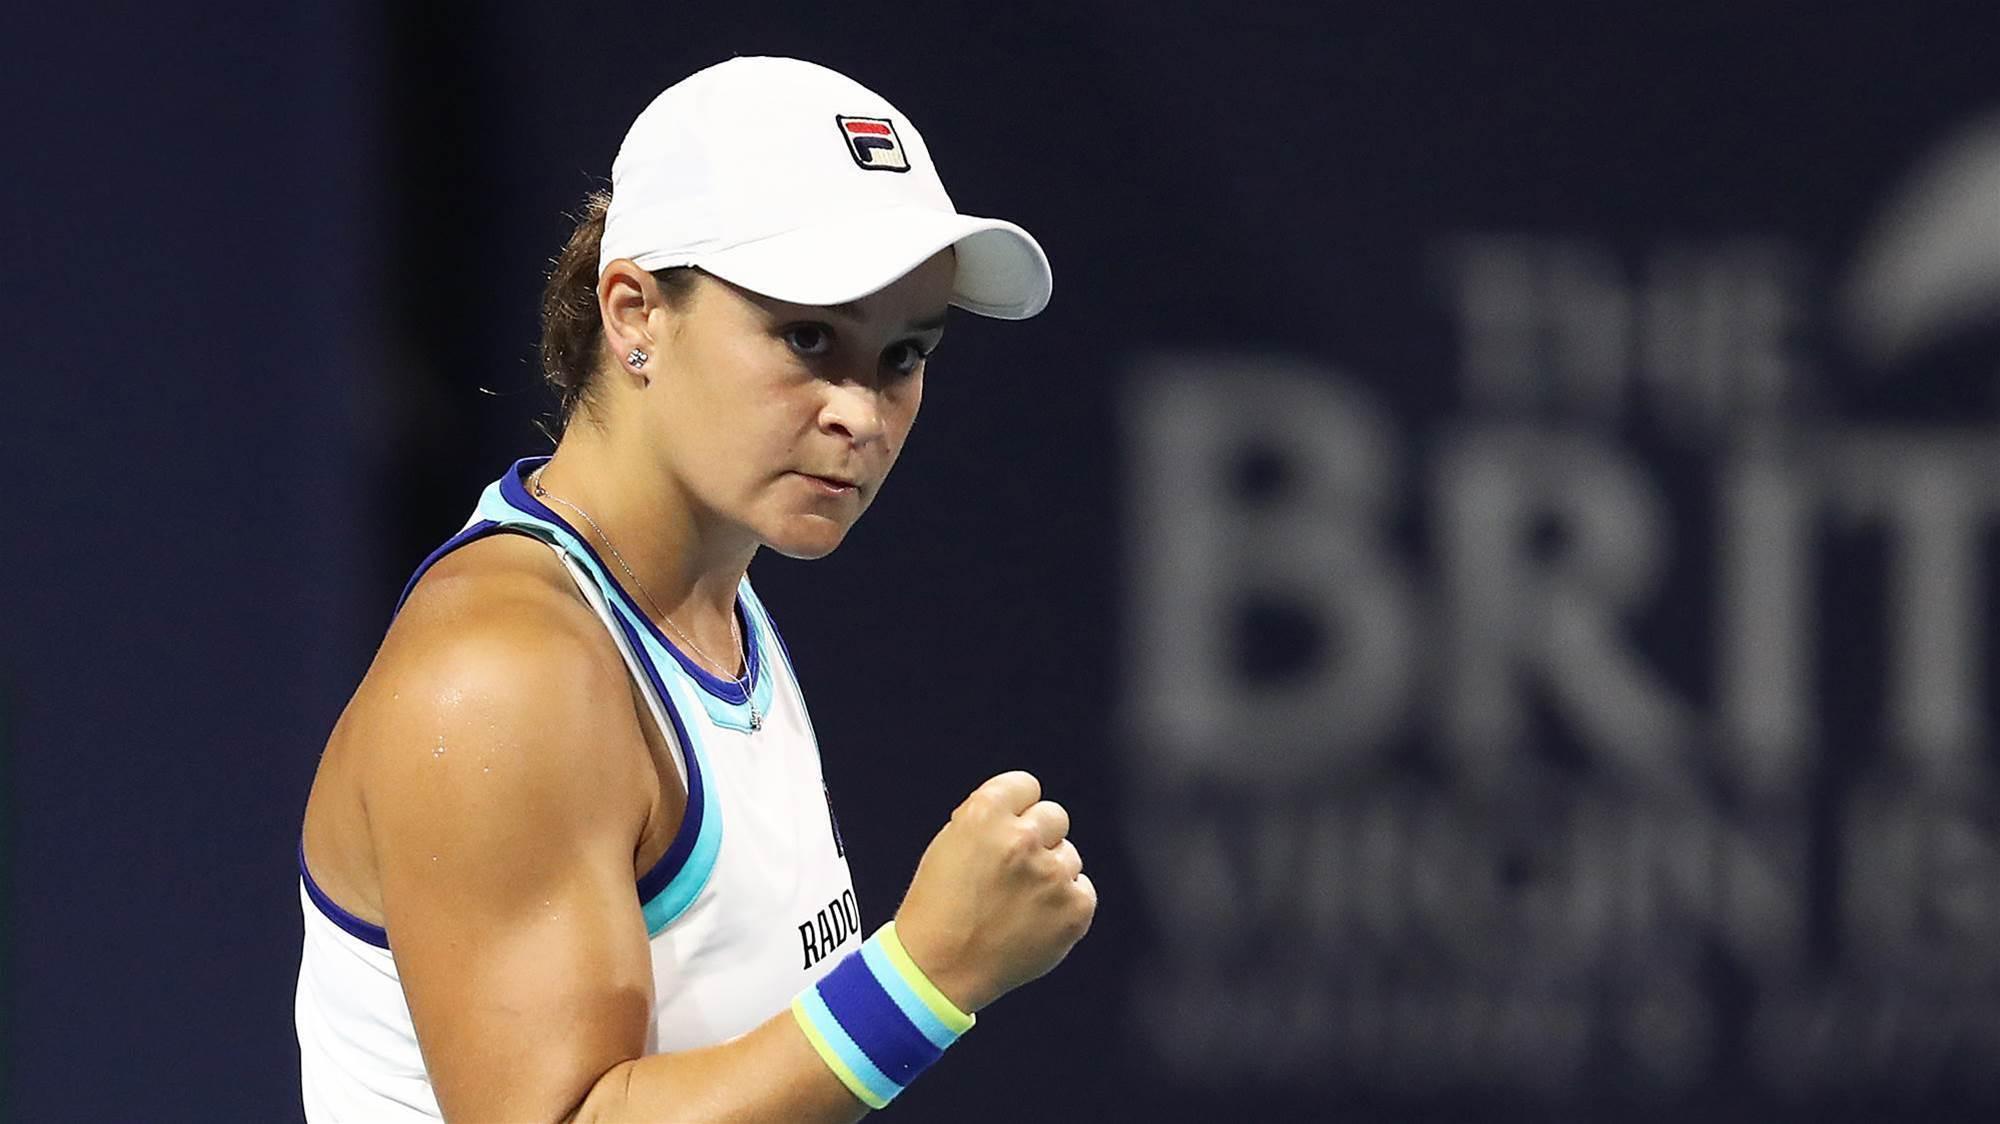 Barty to break into Top 10 after Kvitova win